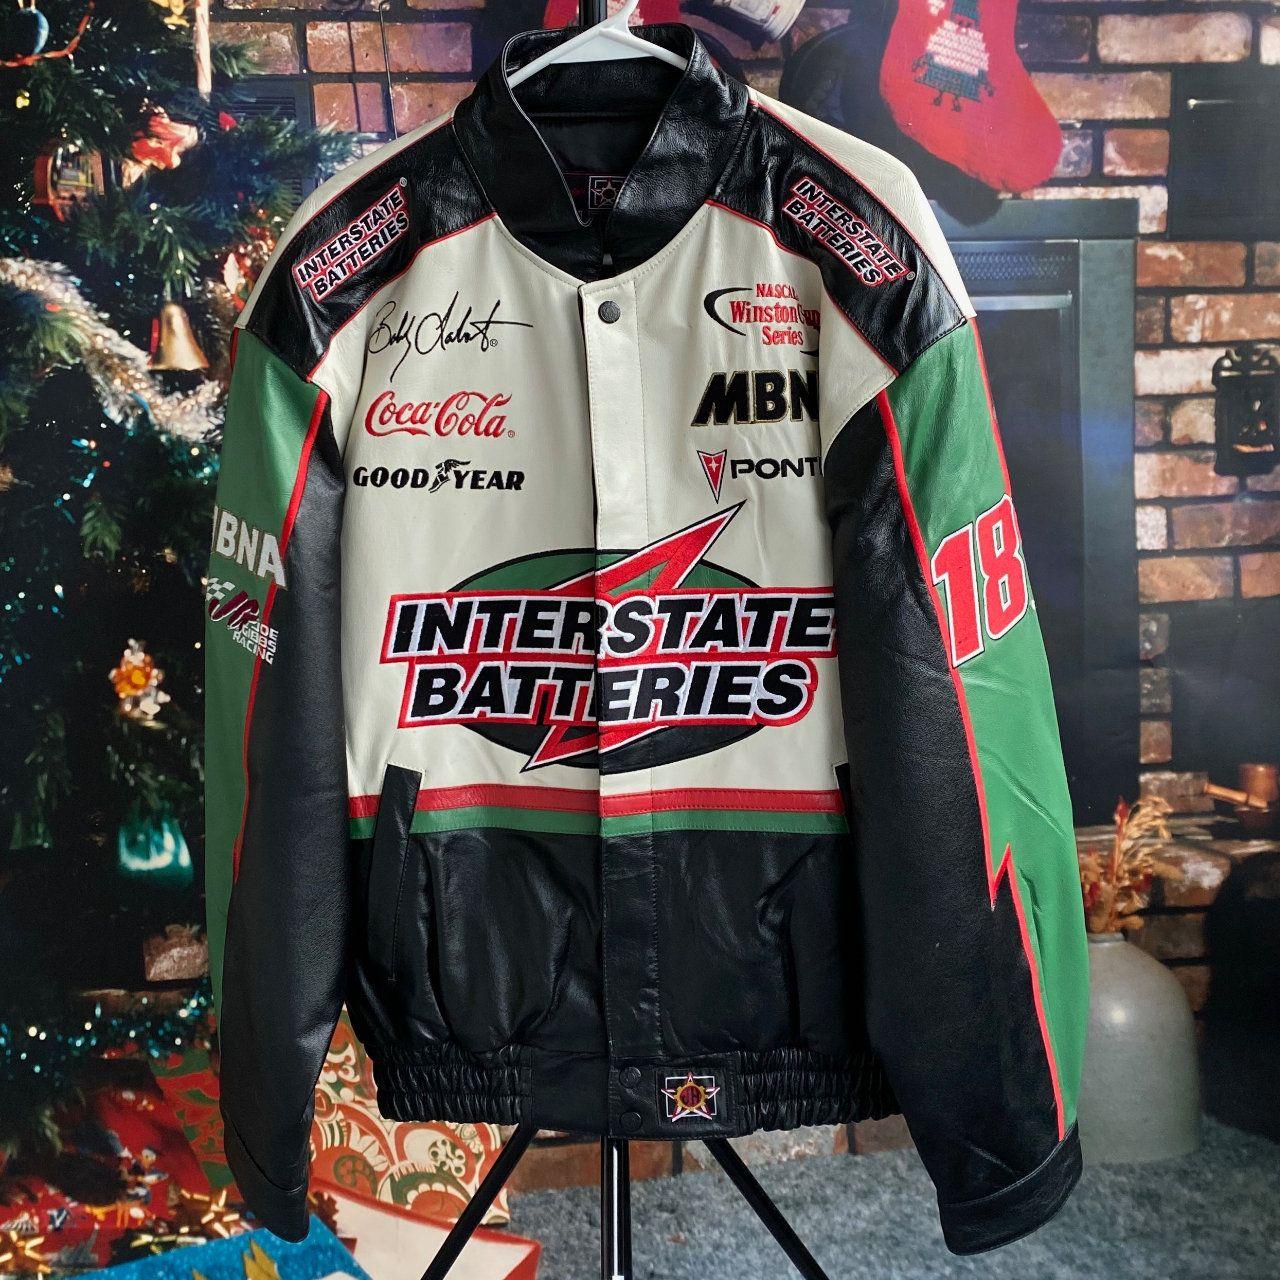 Vintage Bobby Labonte Interstate Batteries Nascar Authentic Drivers Line Leather Jacket By Deutschepost On Etsy Vintage Leather Jacket Leather Jacket Fashion [ 1280 x 1280 Pixel ]